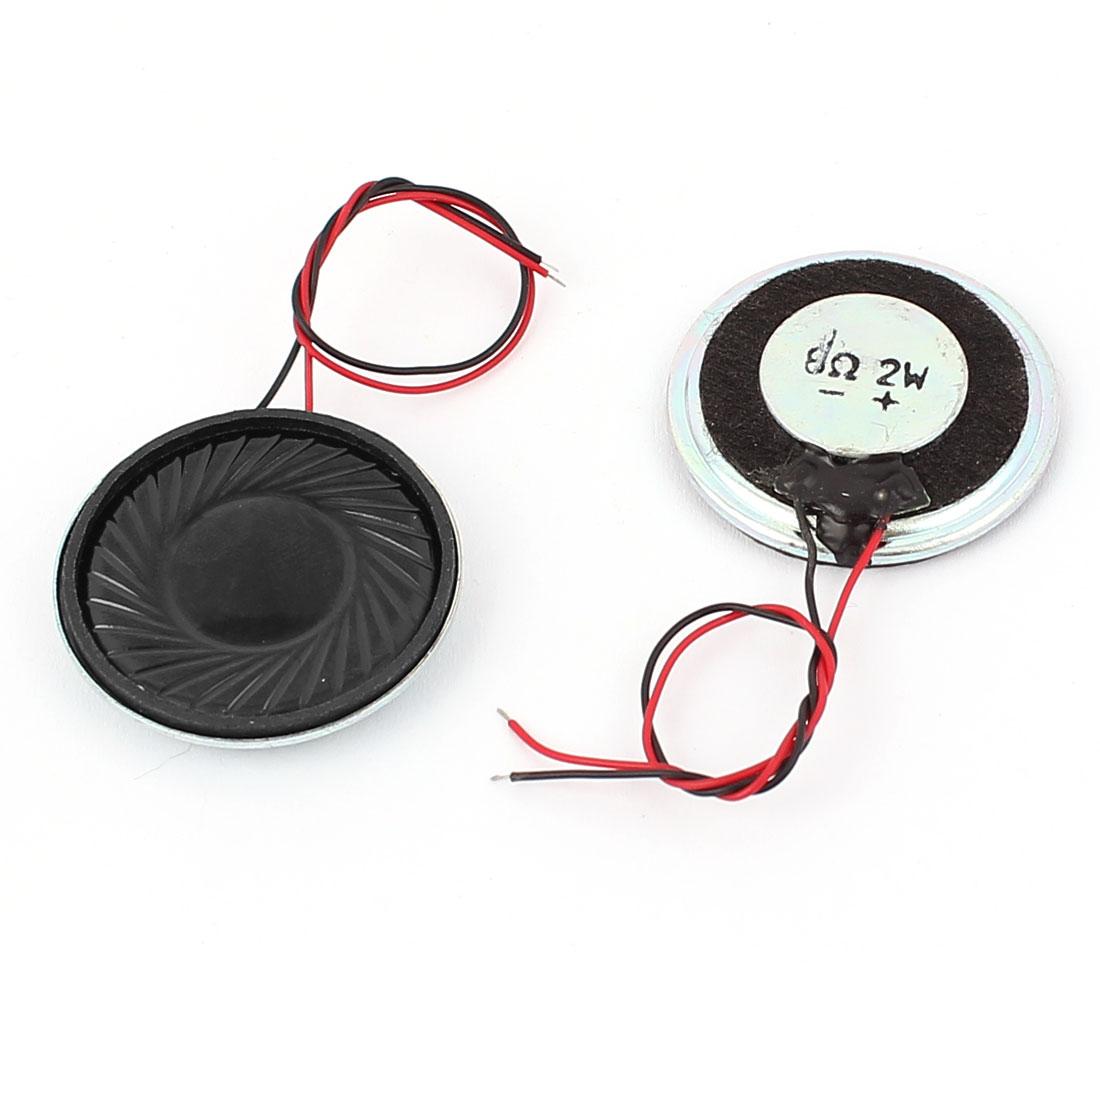 2Pcs 8 Ohm 2W Round Metal Shell Wire Lead Internal Magnet Speaker Horn